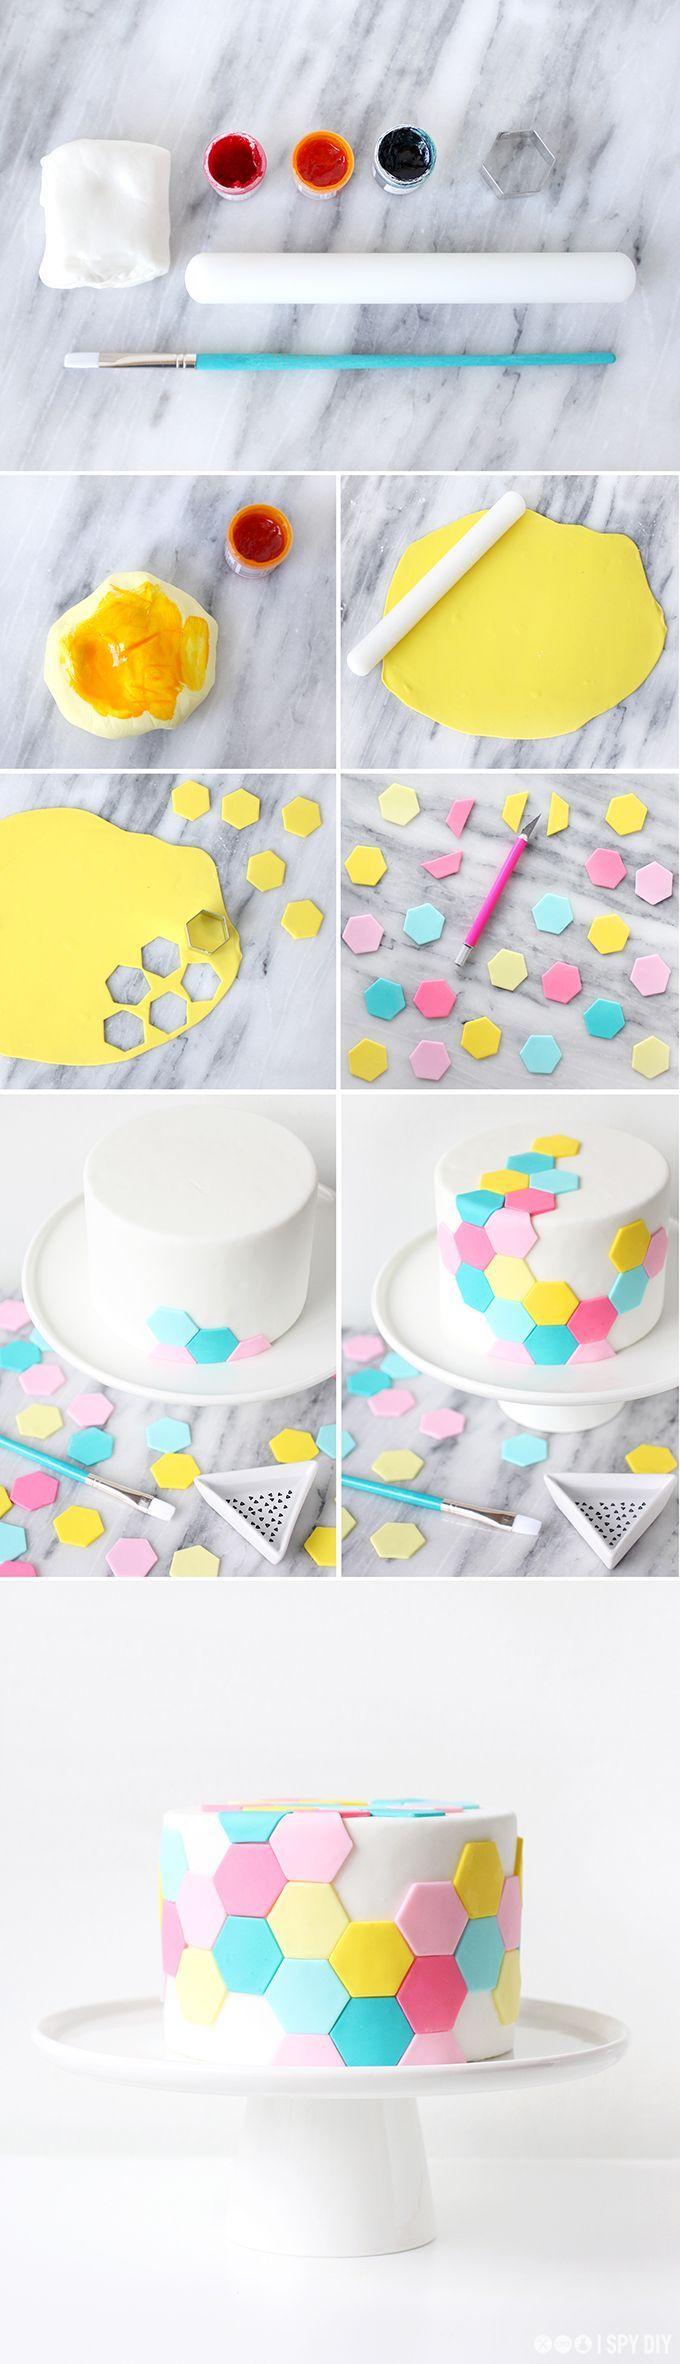 SWEET STEPS | Pastel Hexagon Tile Cake BY ISPYDIY